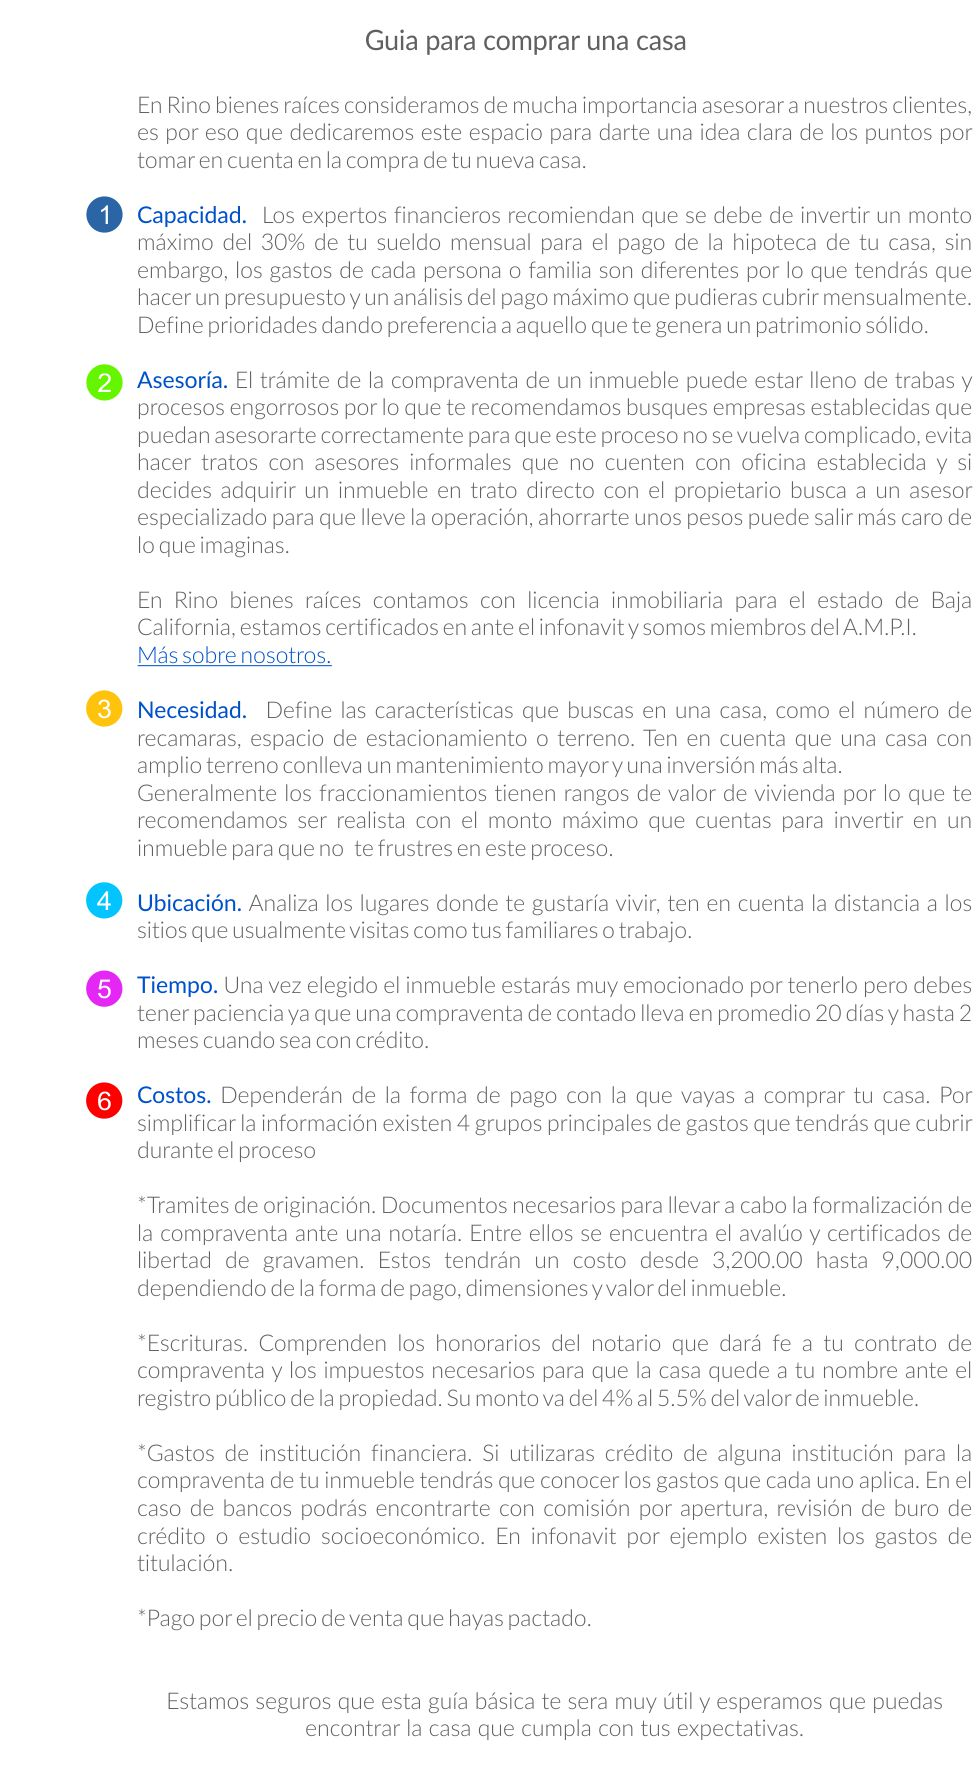 Guia_del_comprador_4.jpg